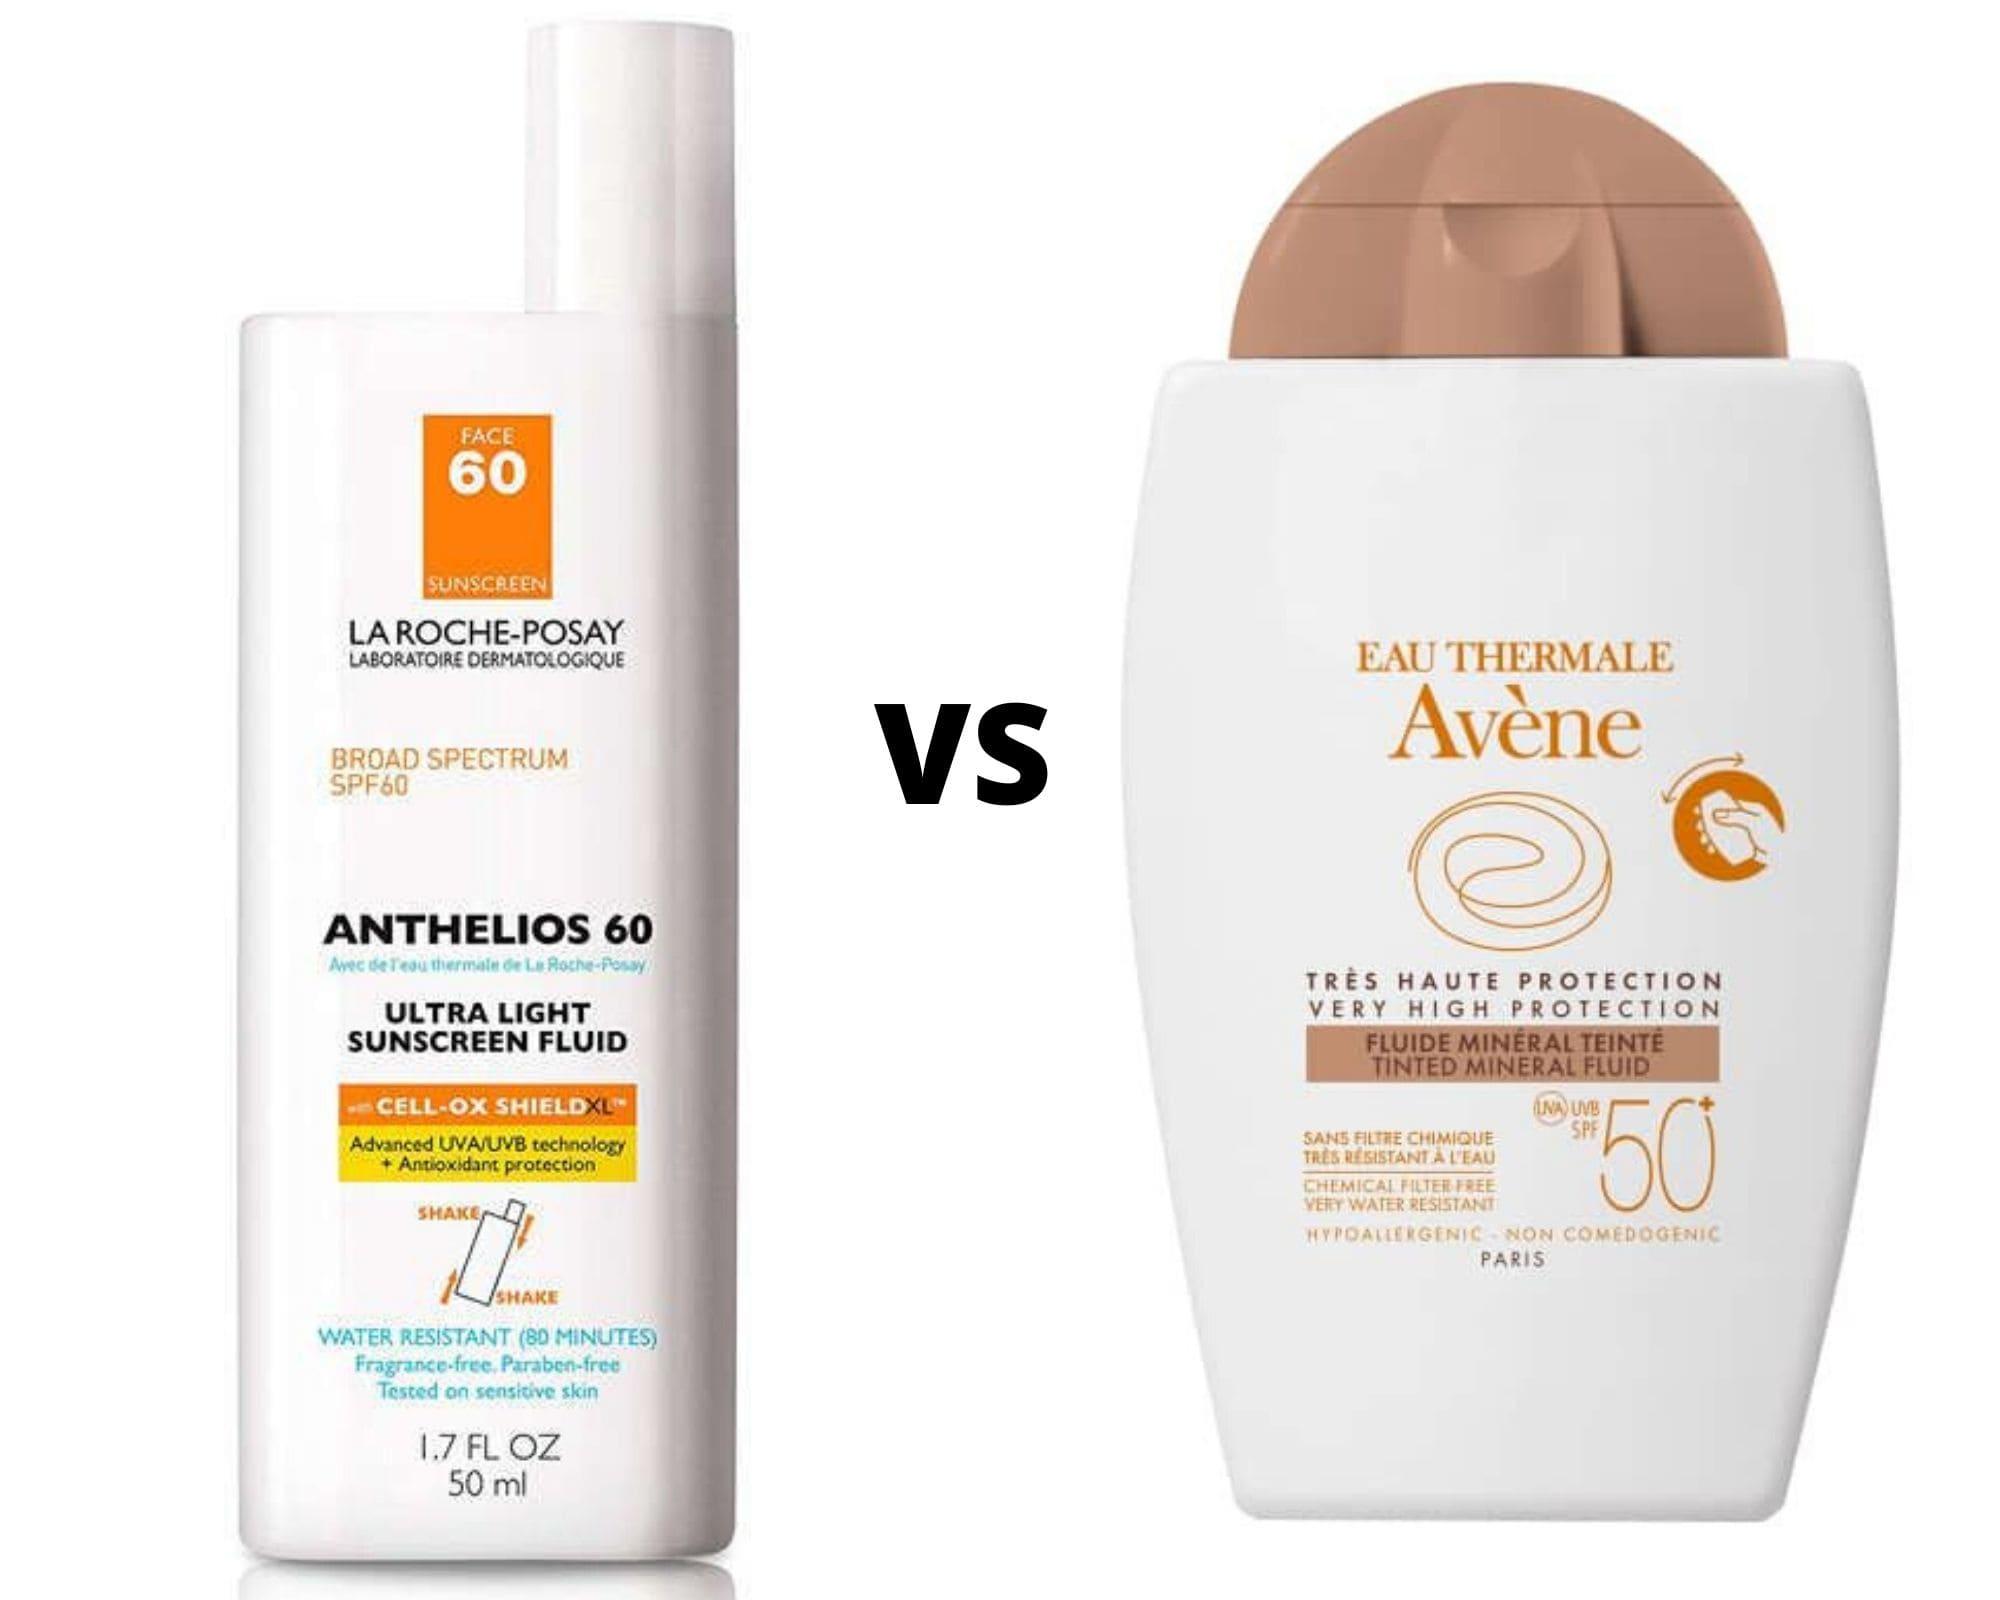 Avene or La Roche-Posay Sunscreen